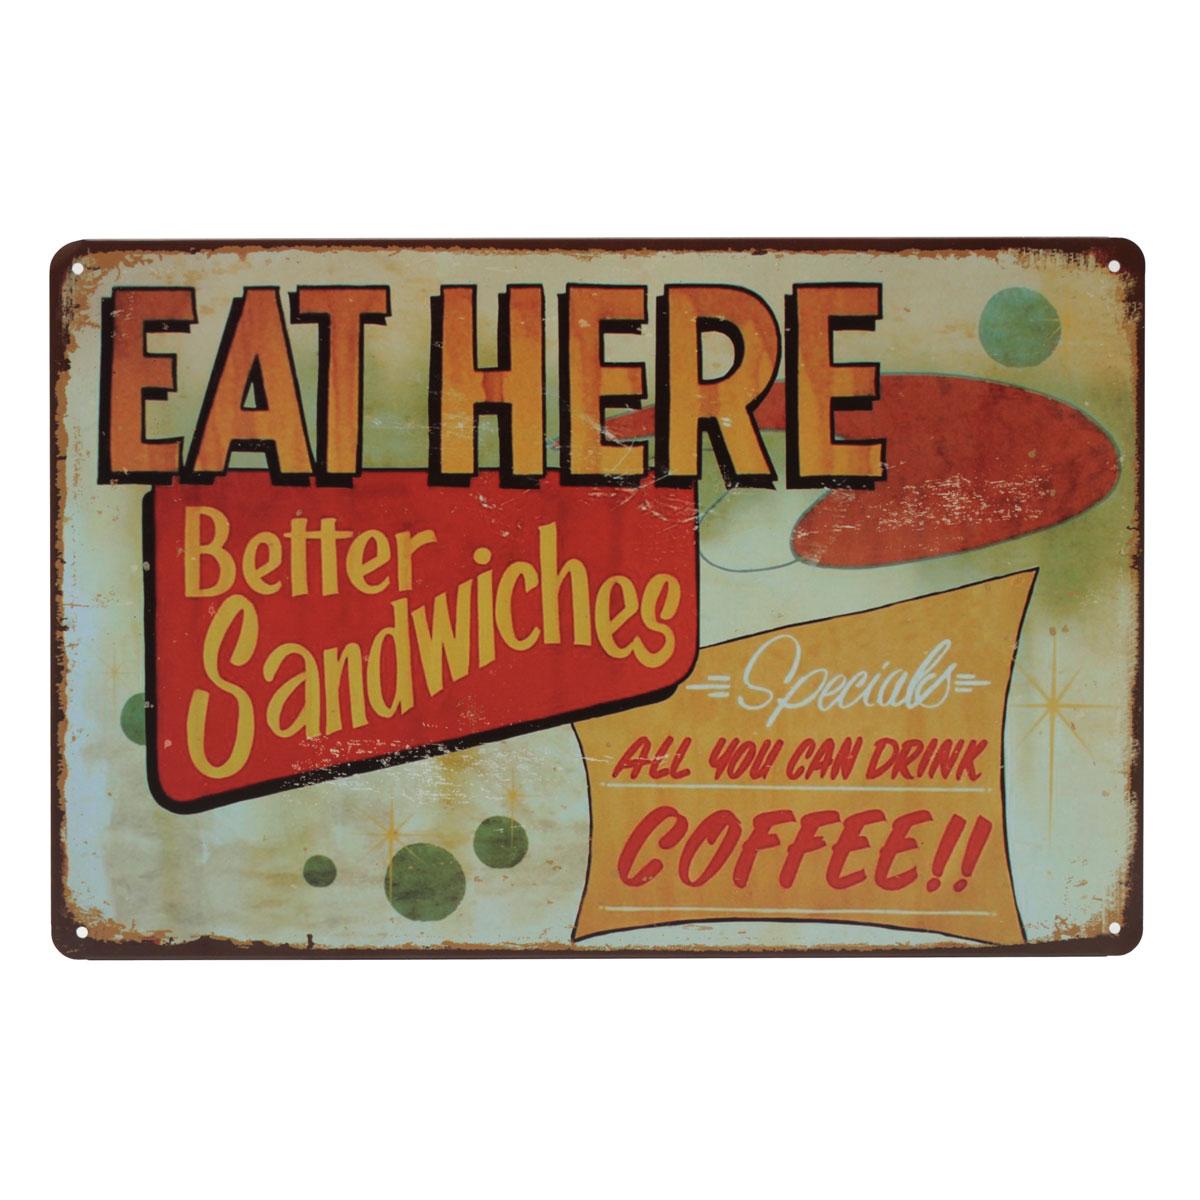 Retro Kitchen Wall Decor 20x30cm Retro Metal Tin Sign Plaque Food Wall Poster Wall Decor